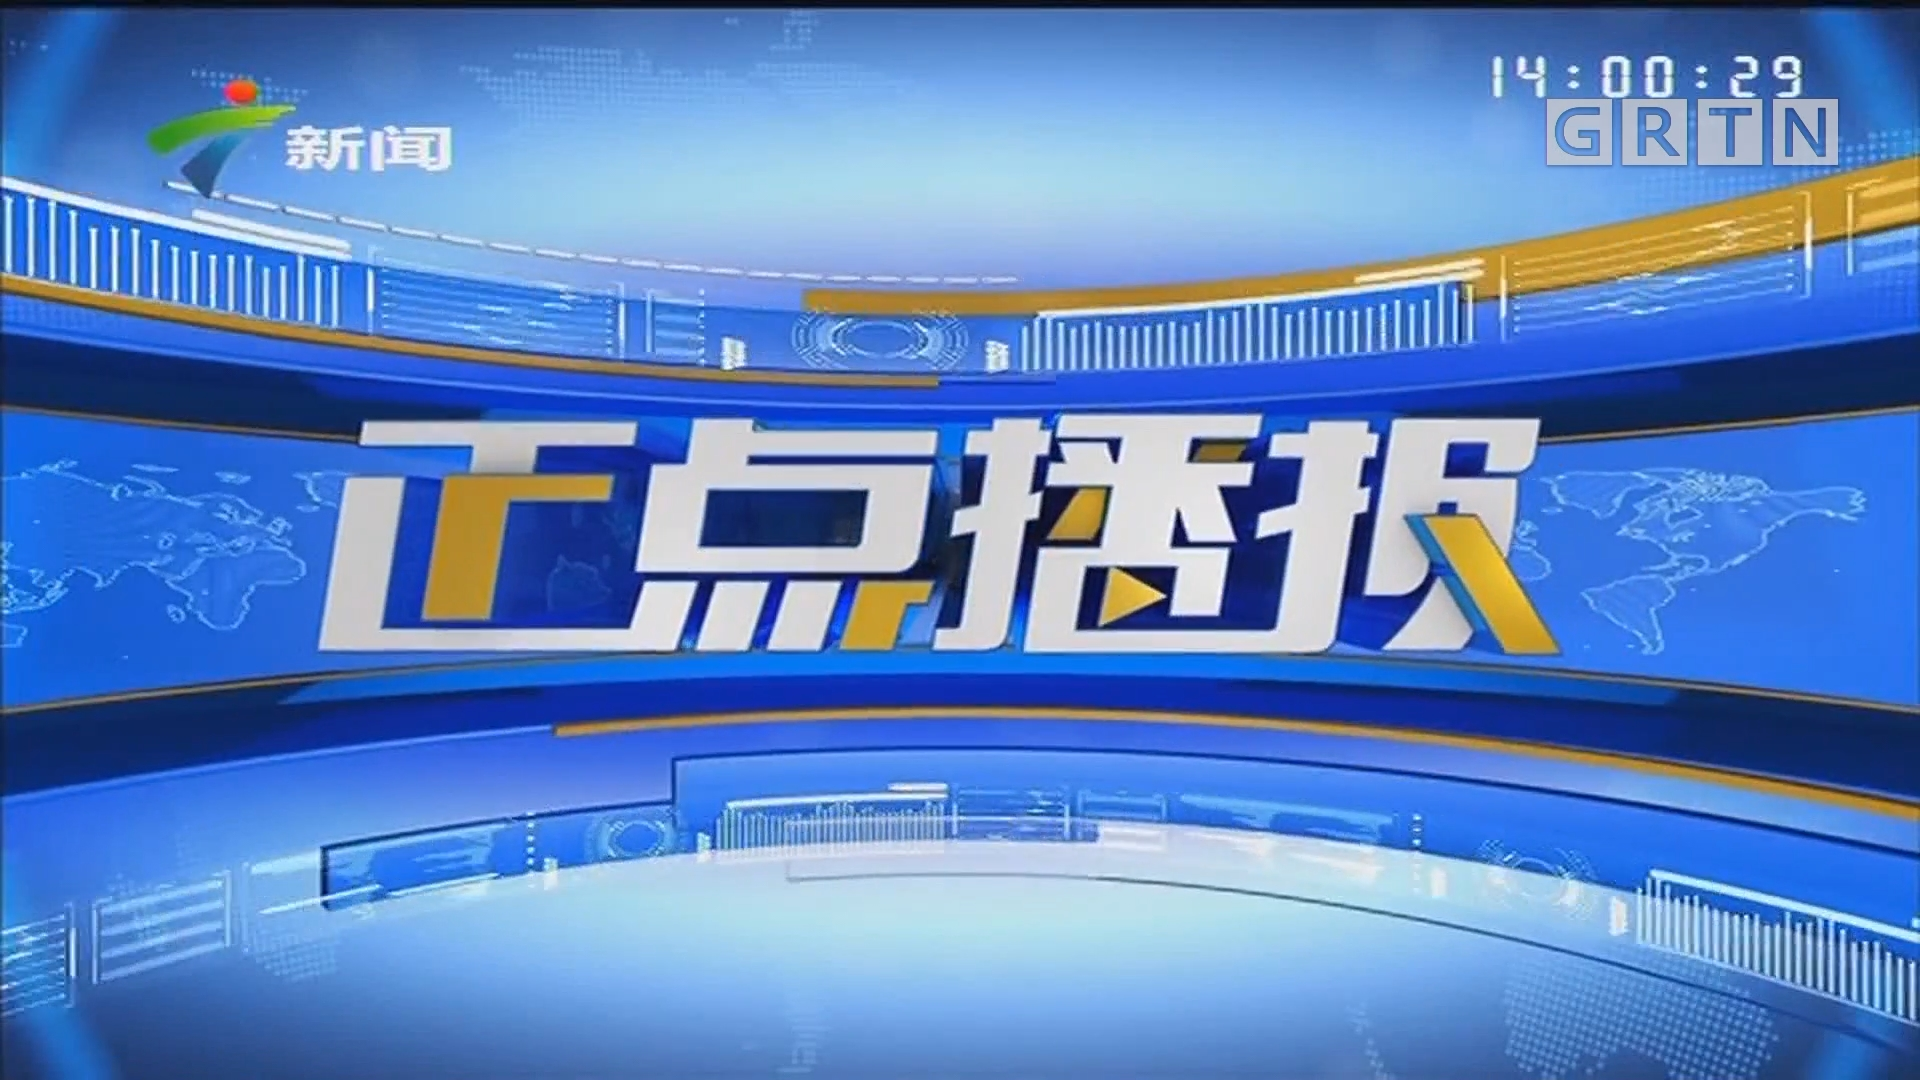 [HD][2019-08-19]正点播报:珠海:万人古筝合奏打破吉尼斯世界纪录